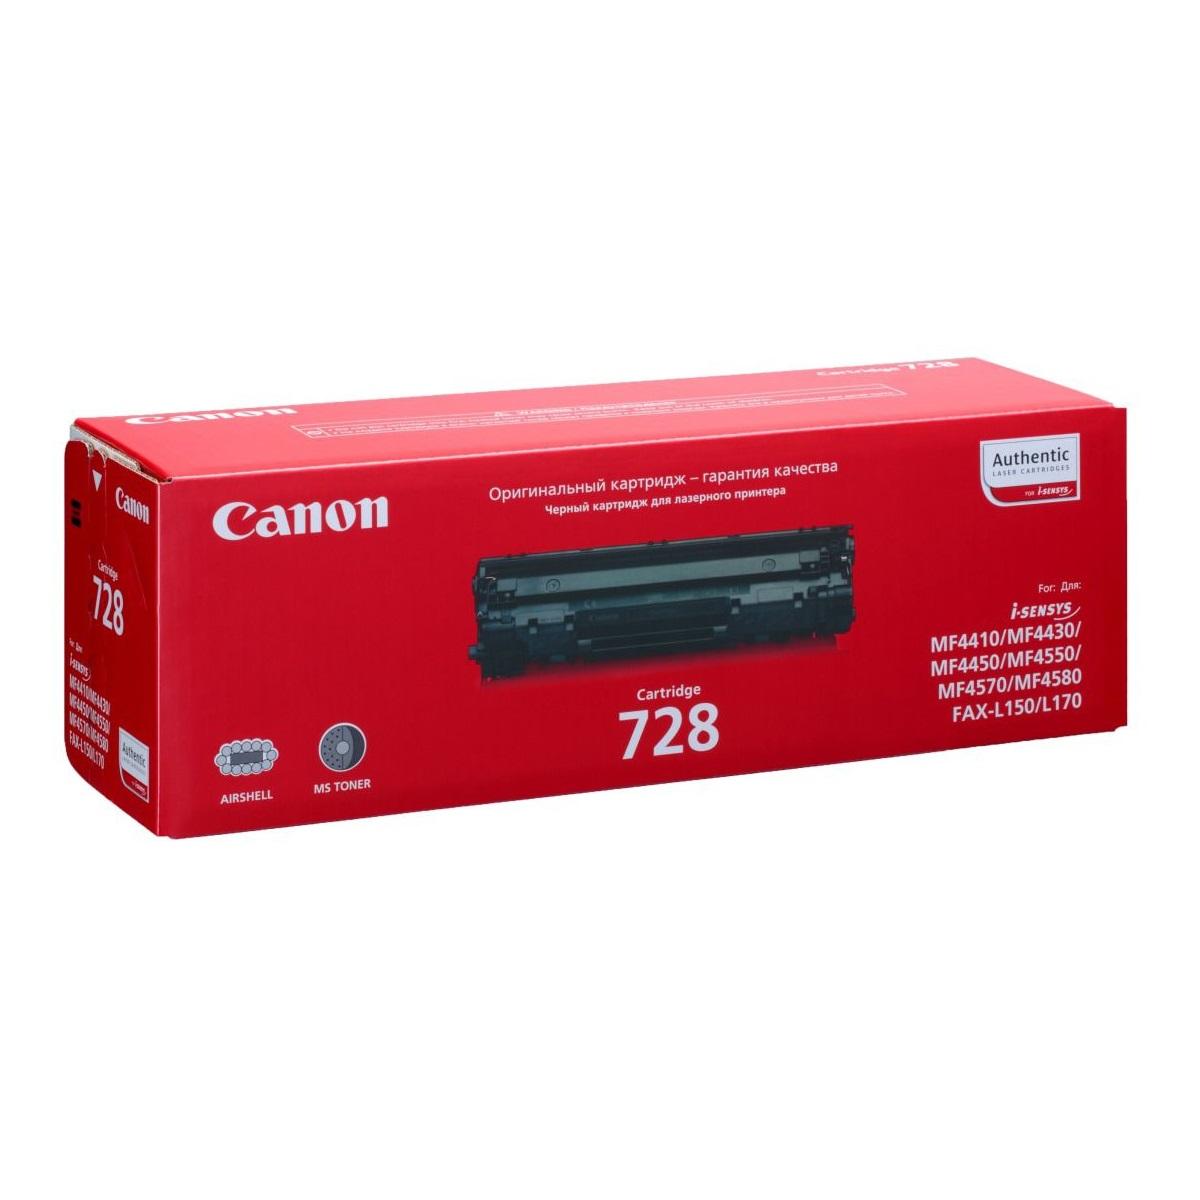 Тонер Картридж Cactus CS-TK1150 черный для Kyocera Ecosys P2235d/P2235dn/P2235dw/M2735dw (3000стр.)